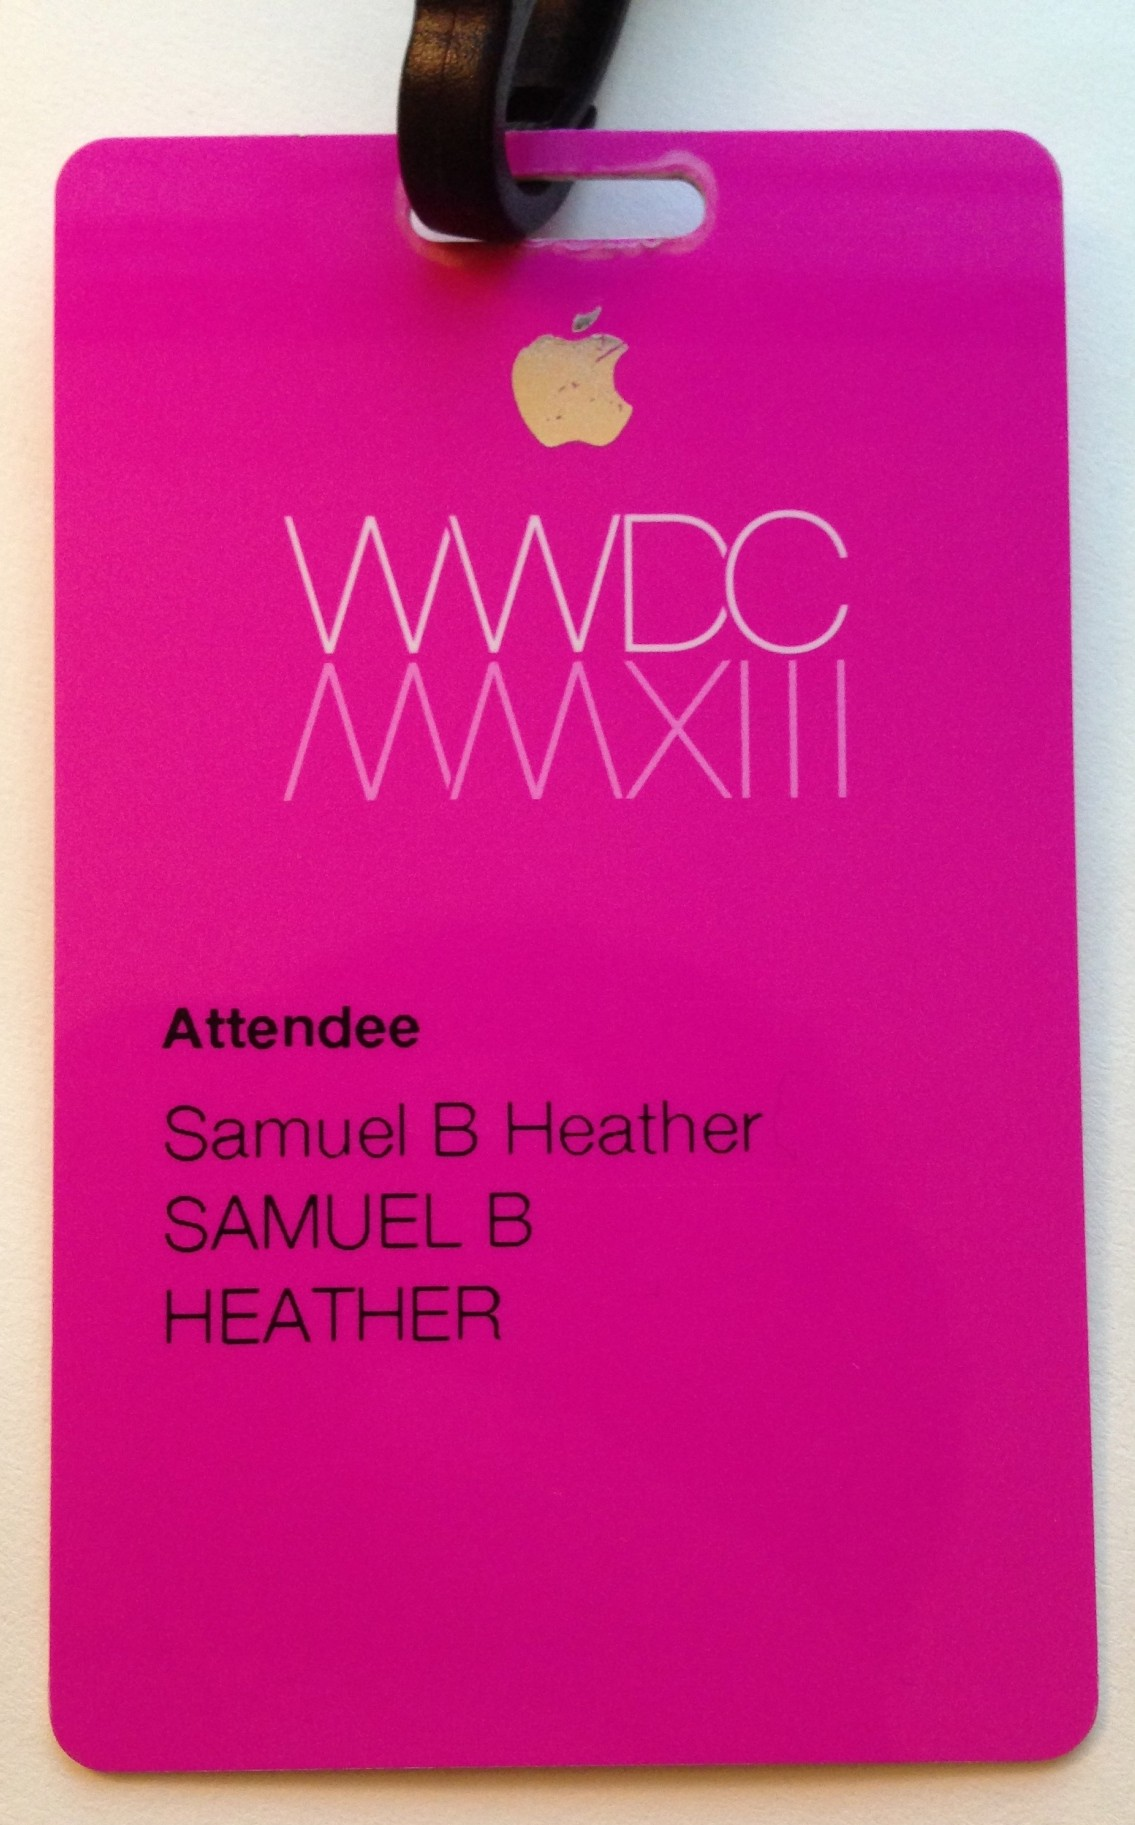 WWDC 2013 Badge